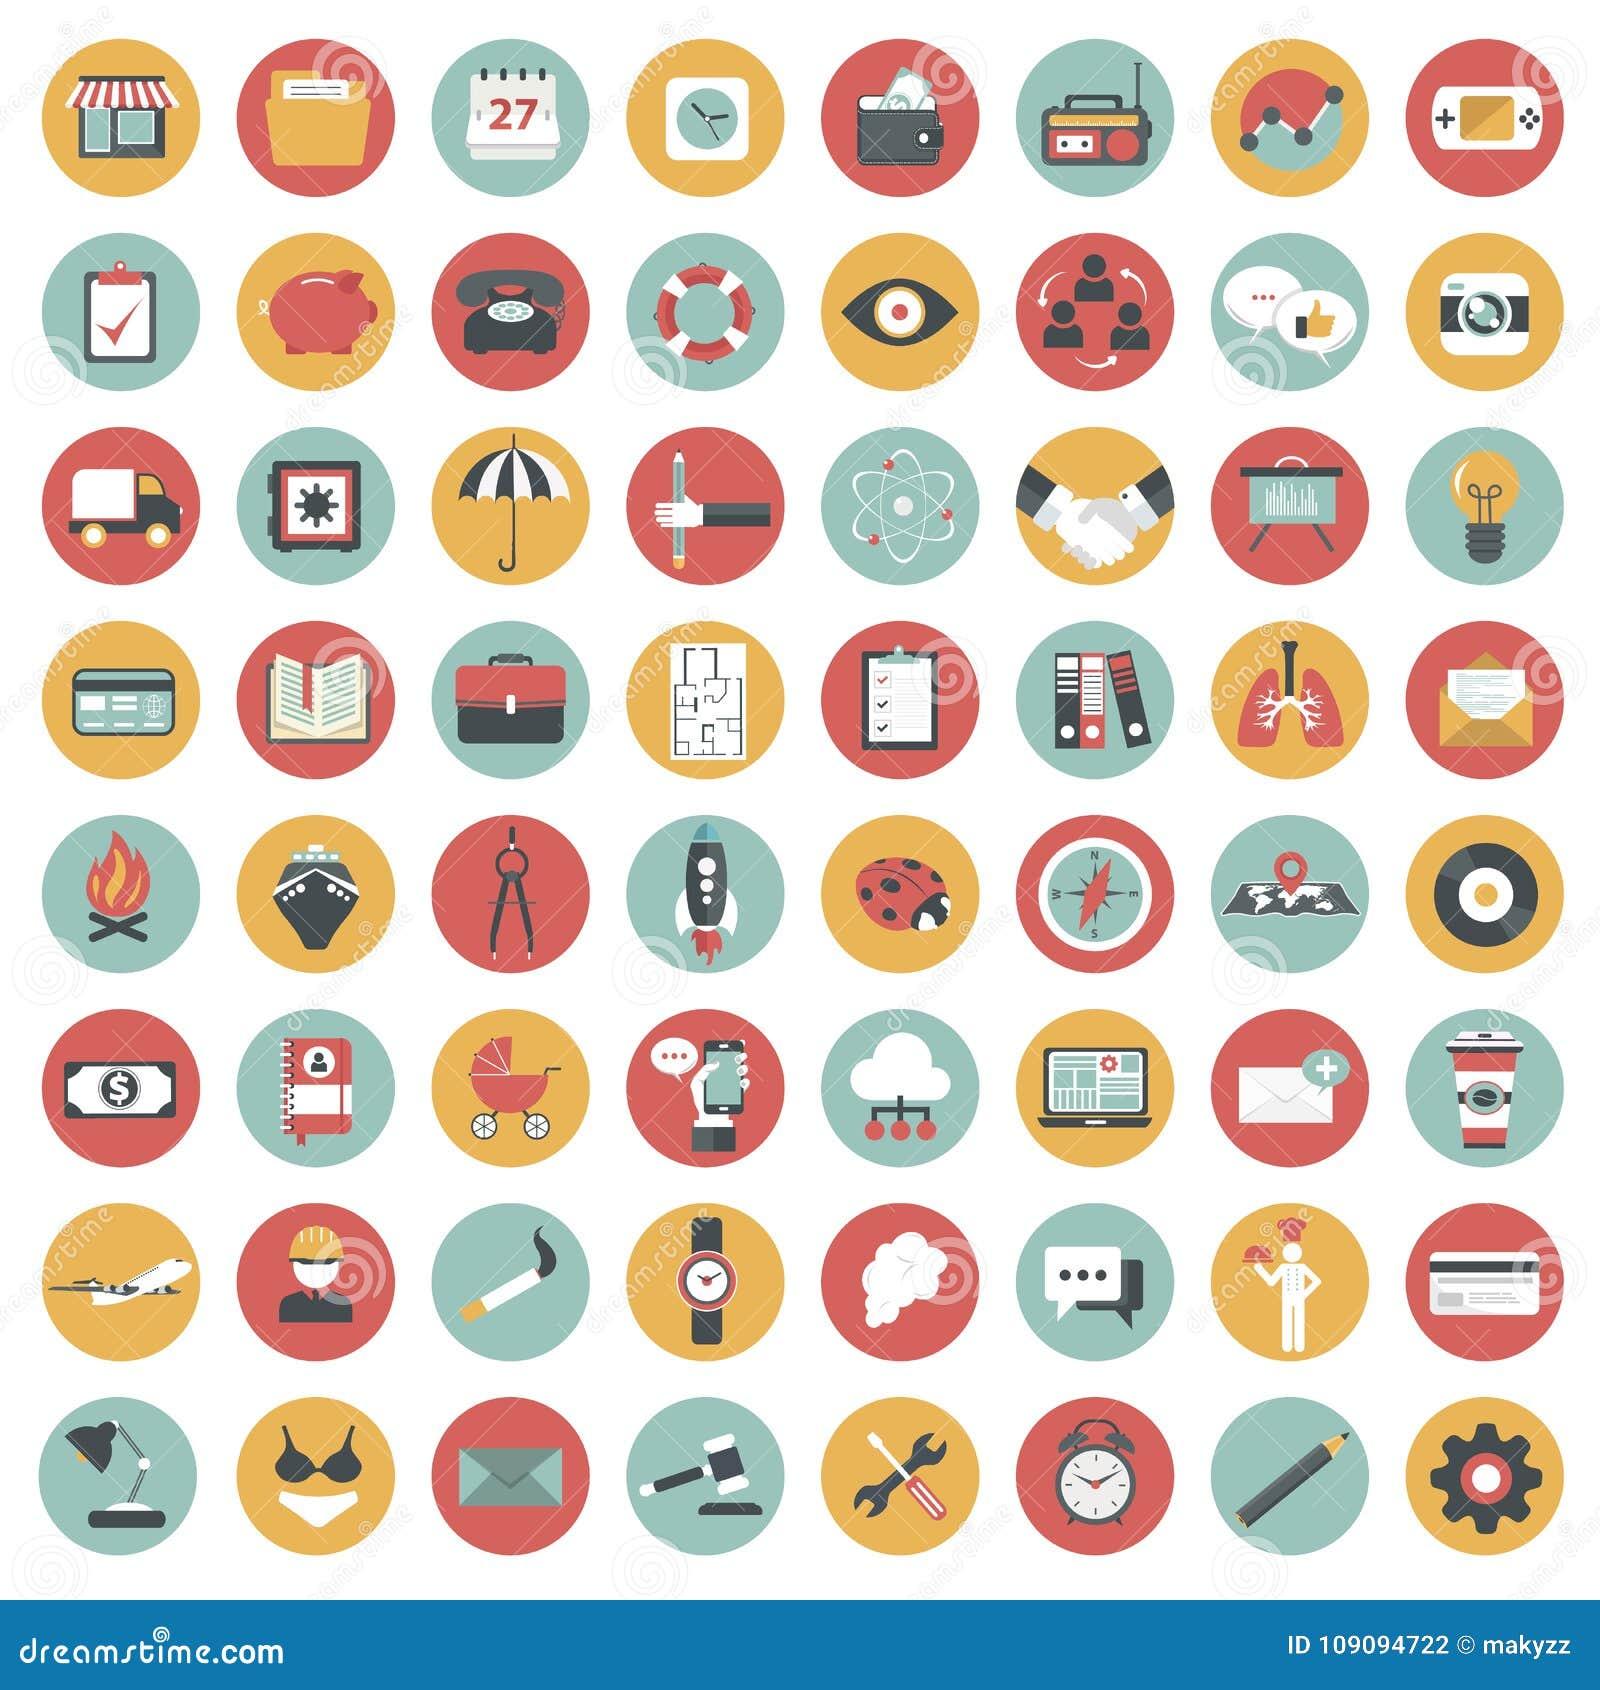 App σύνολο εικονιδίων Εικονίδια για τους ιστοχώρους και κινητές εφαρμογές επίπεδος